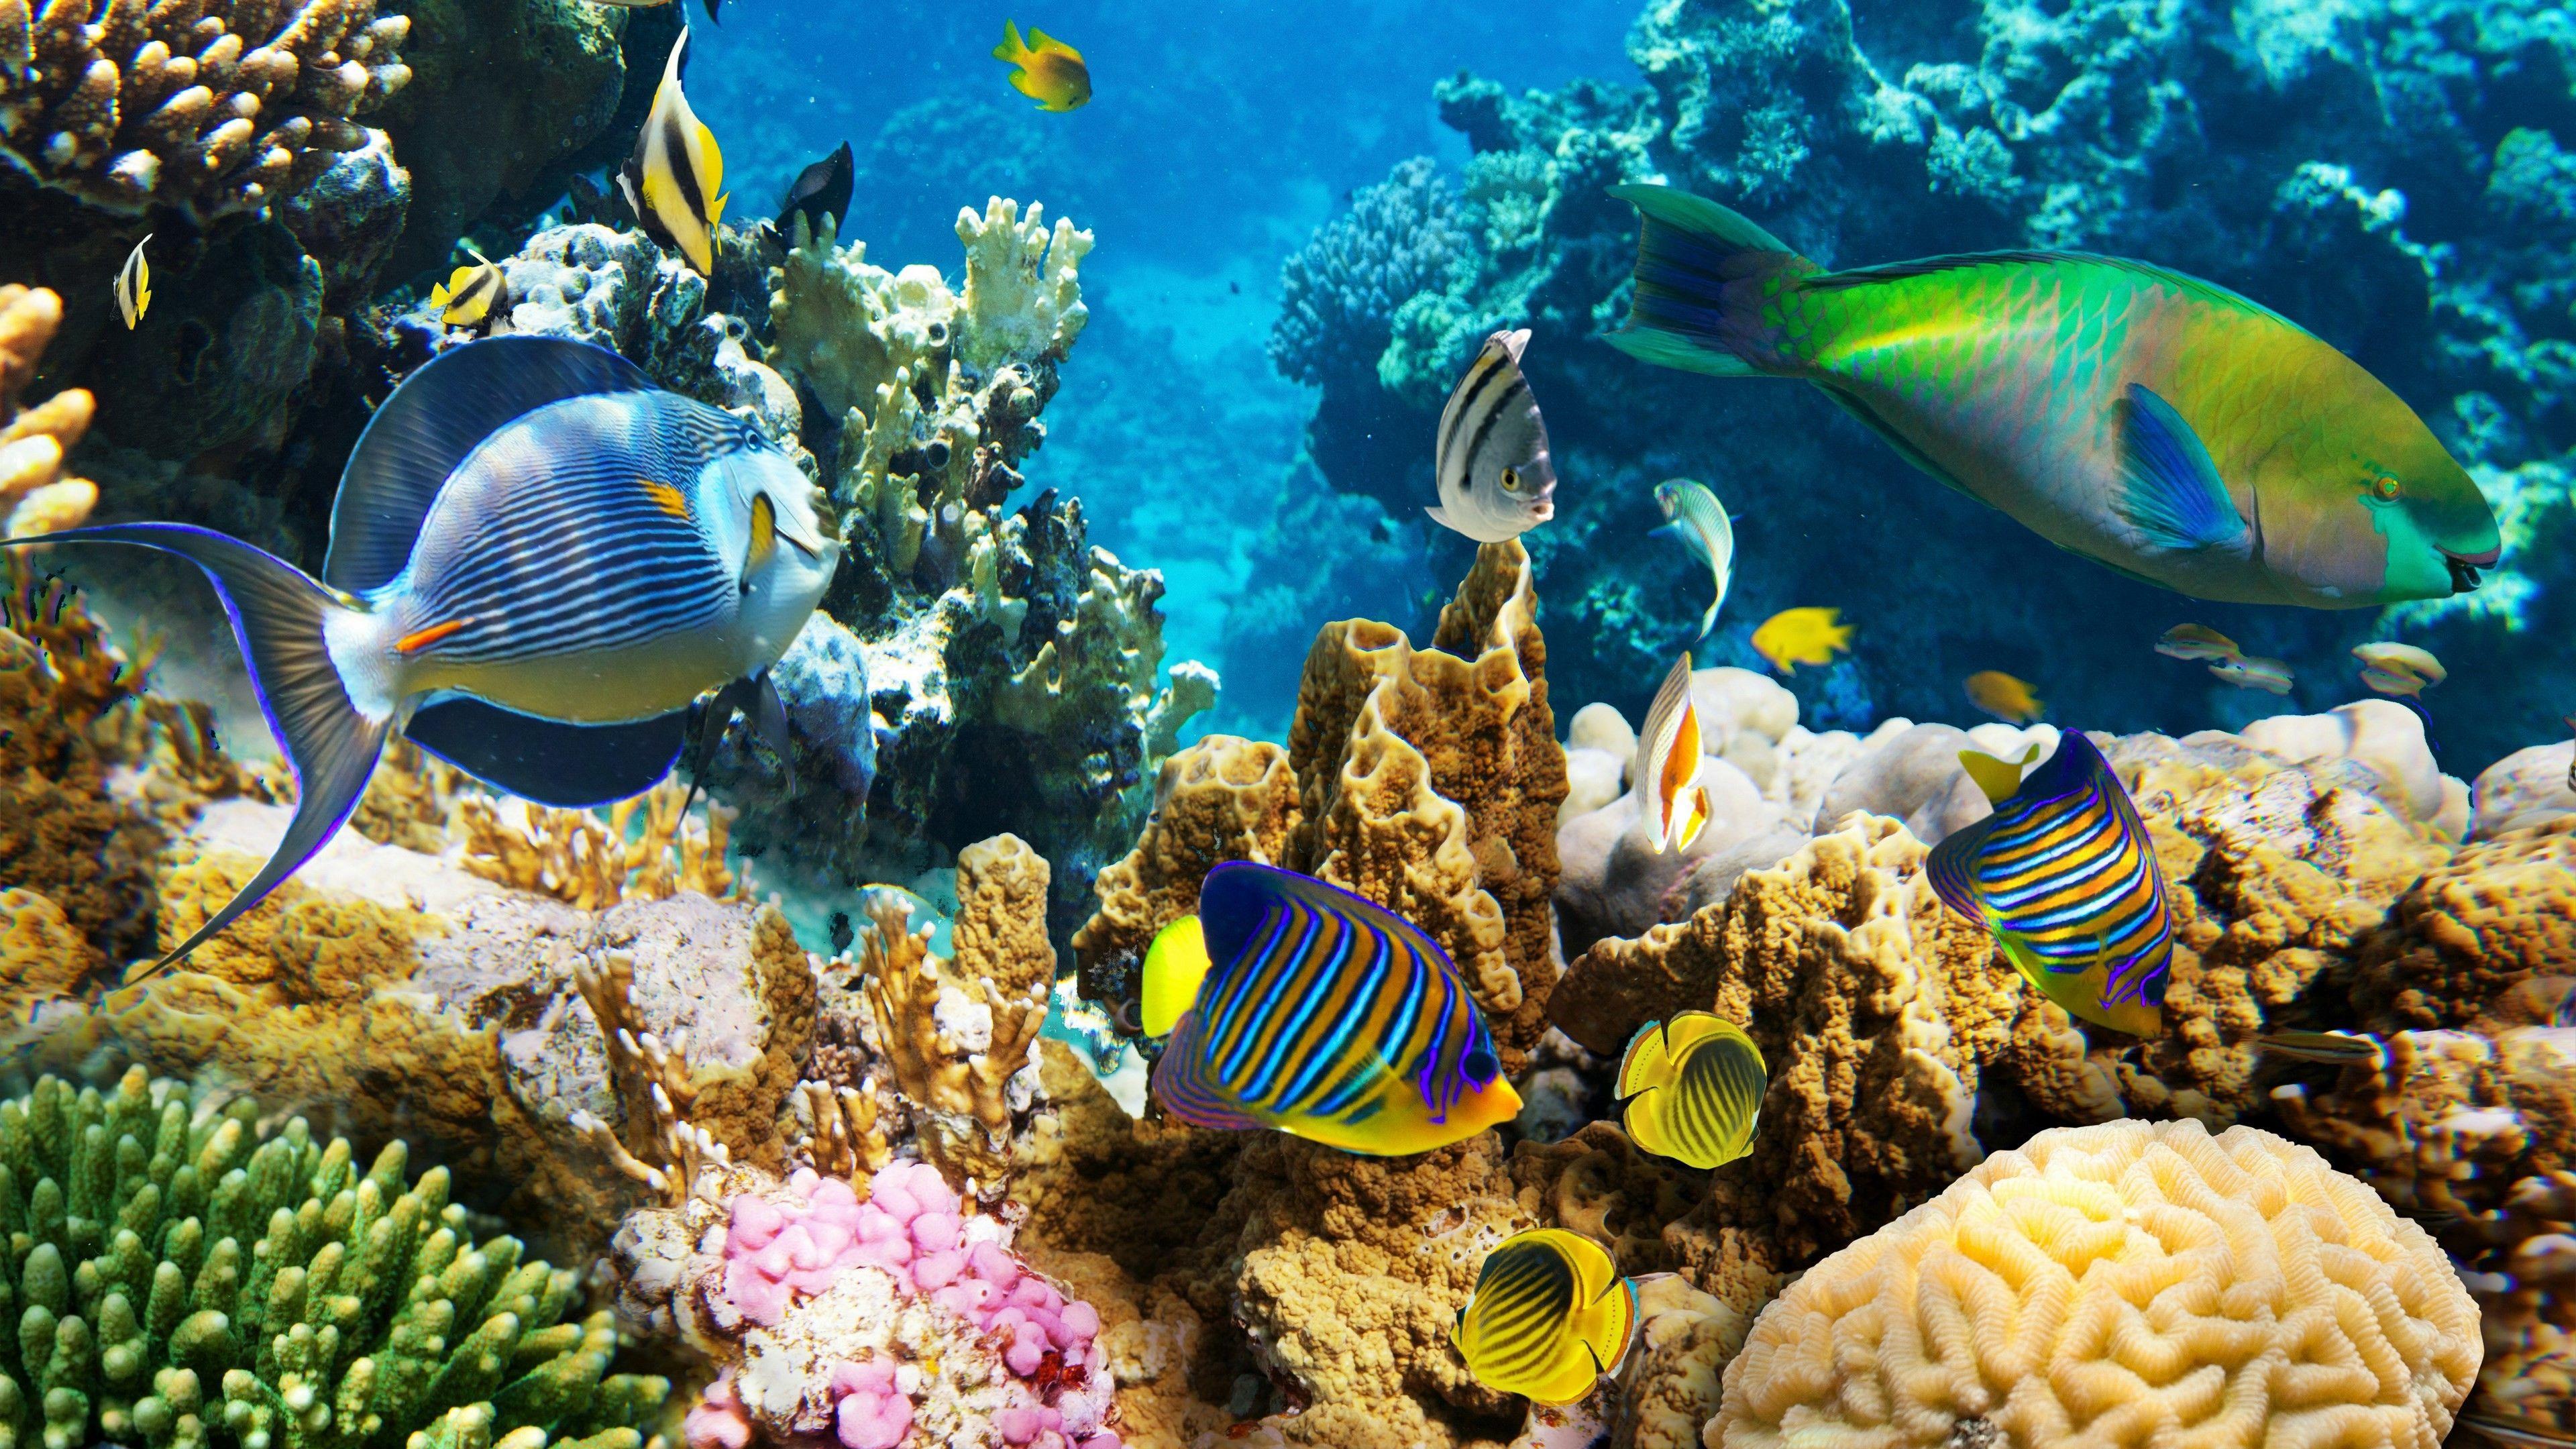 Great Barrier Reef Wallpapers Top Free Great Barrier Reef